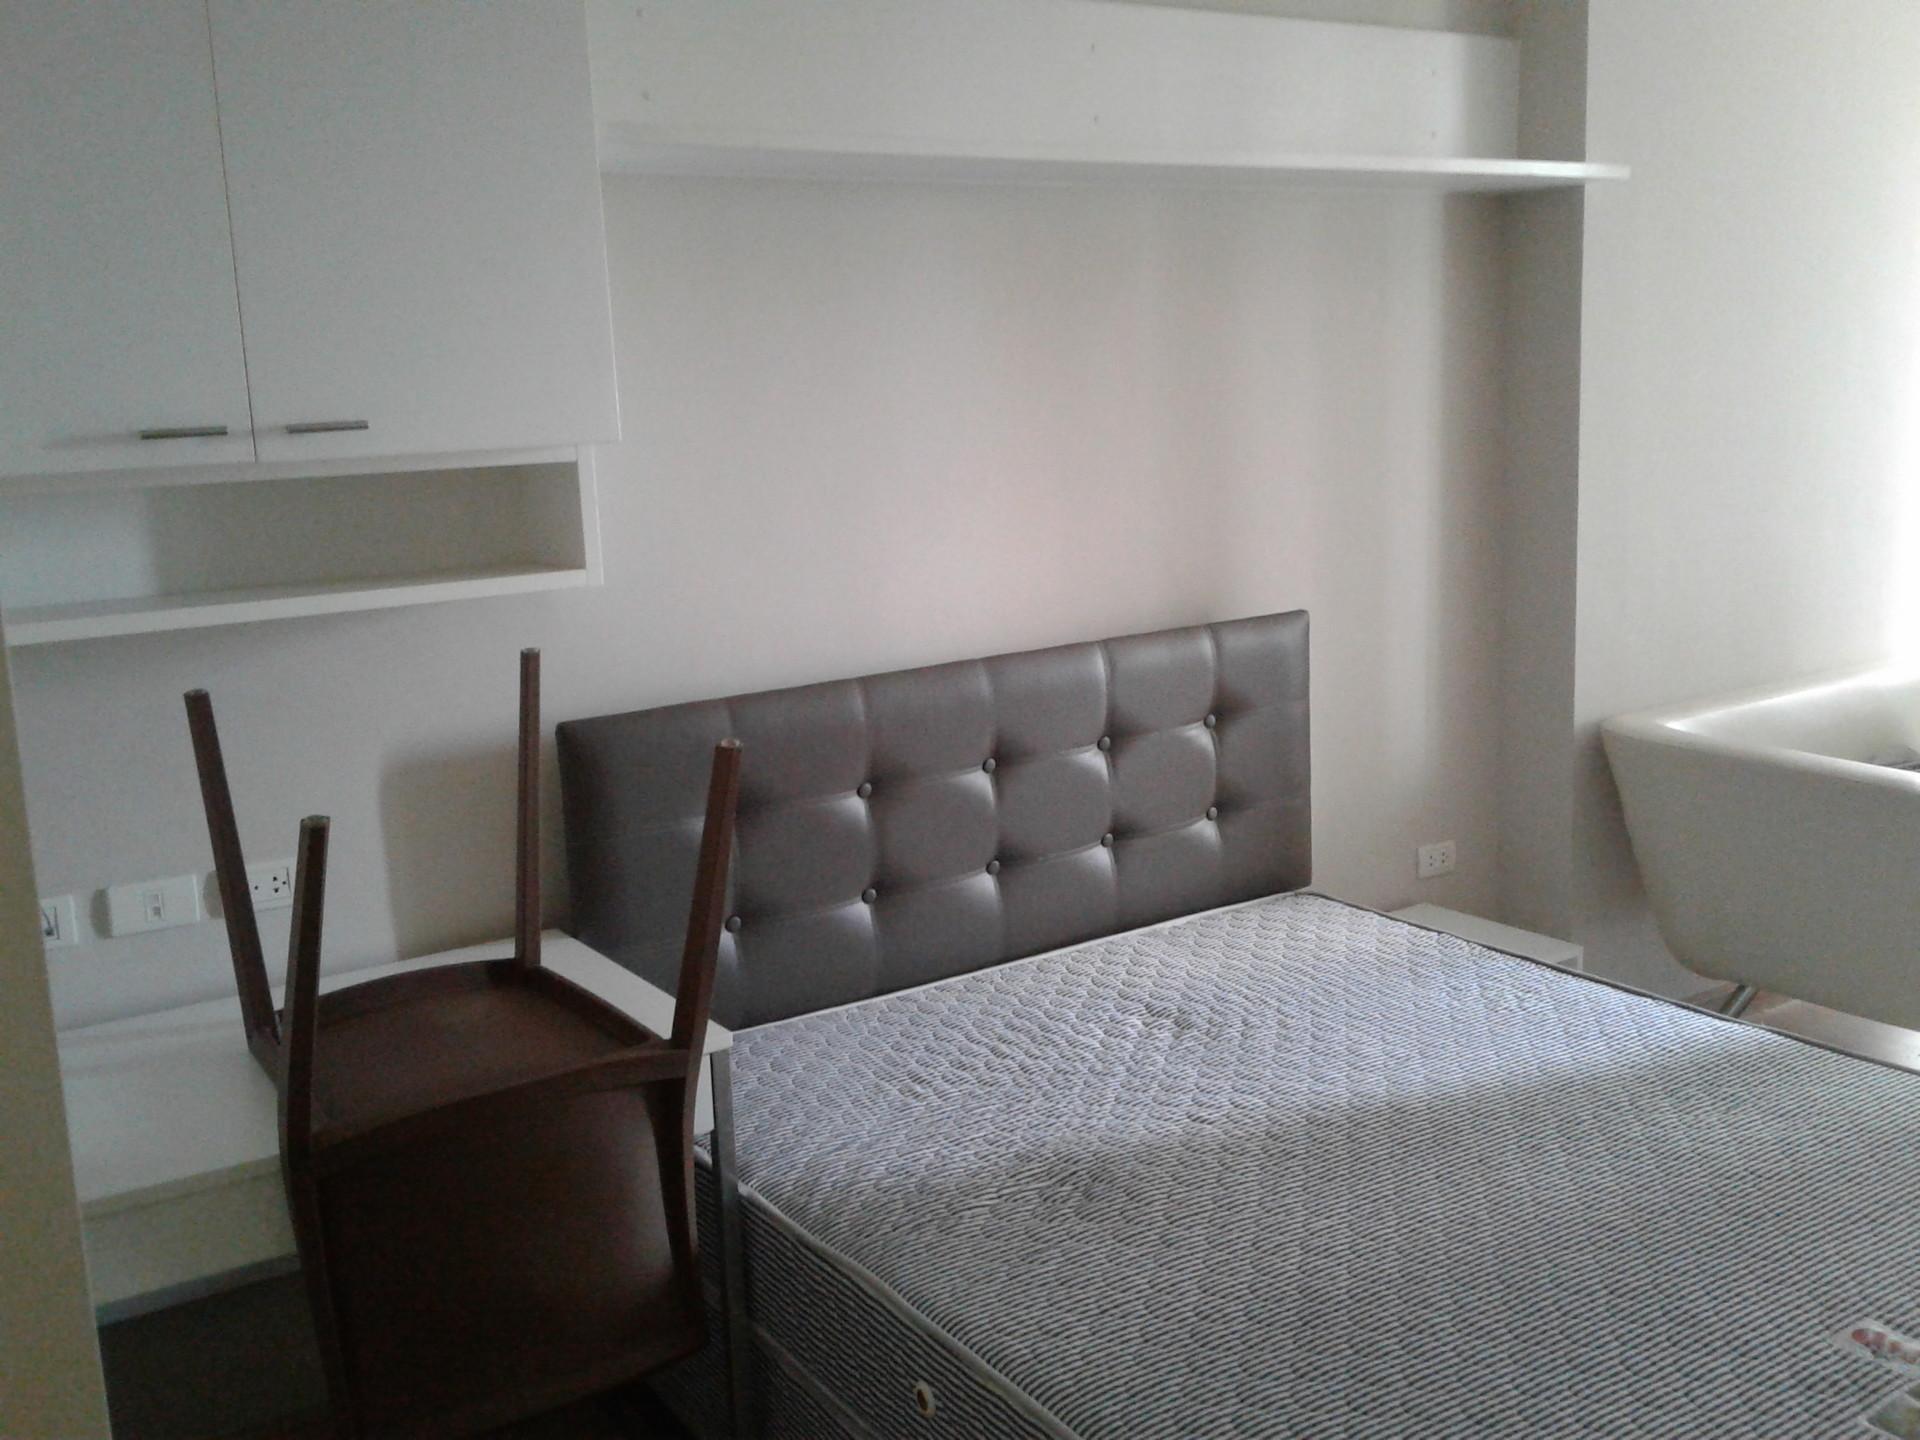 Flat room near Chulalongkorn university in Bangkok | Room